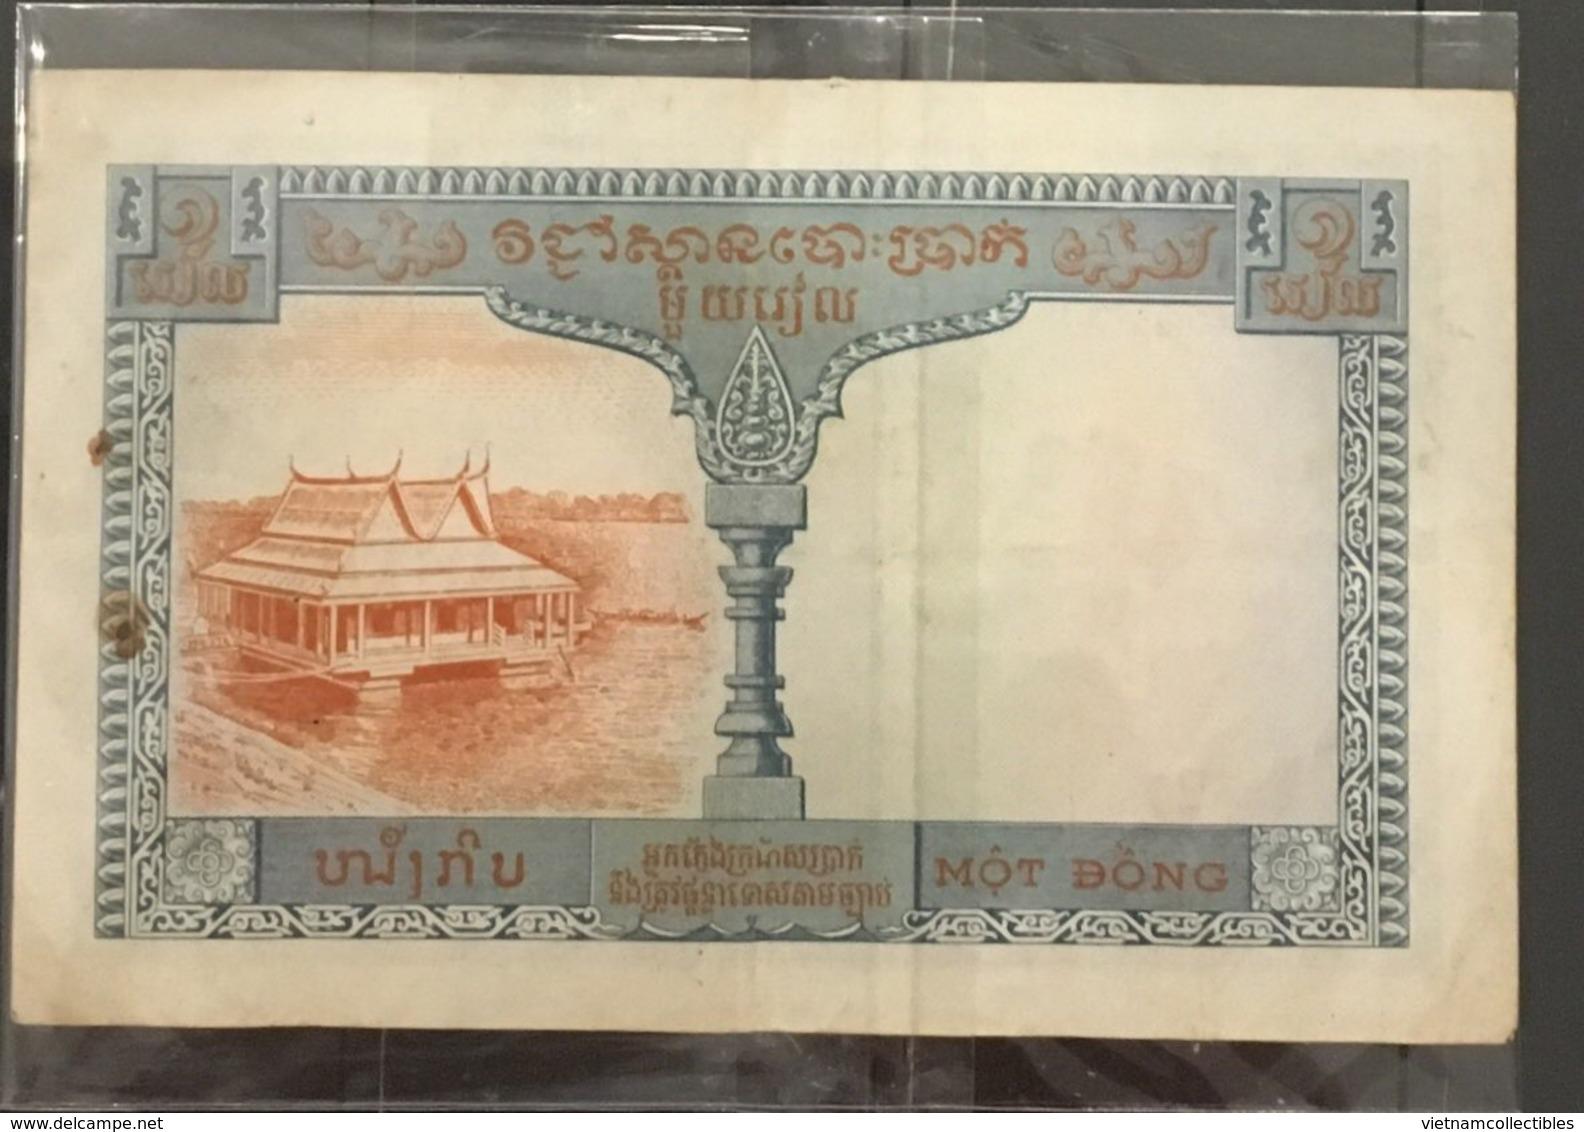 Indochine Indochina Vietnam Viet Nam Laos Cambodia 1 Piastre VF Banknote 1953-1954 - P#94 / 02 Images - Vietnam